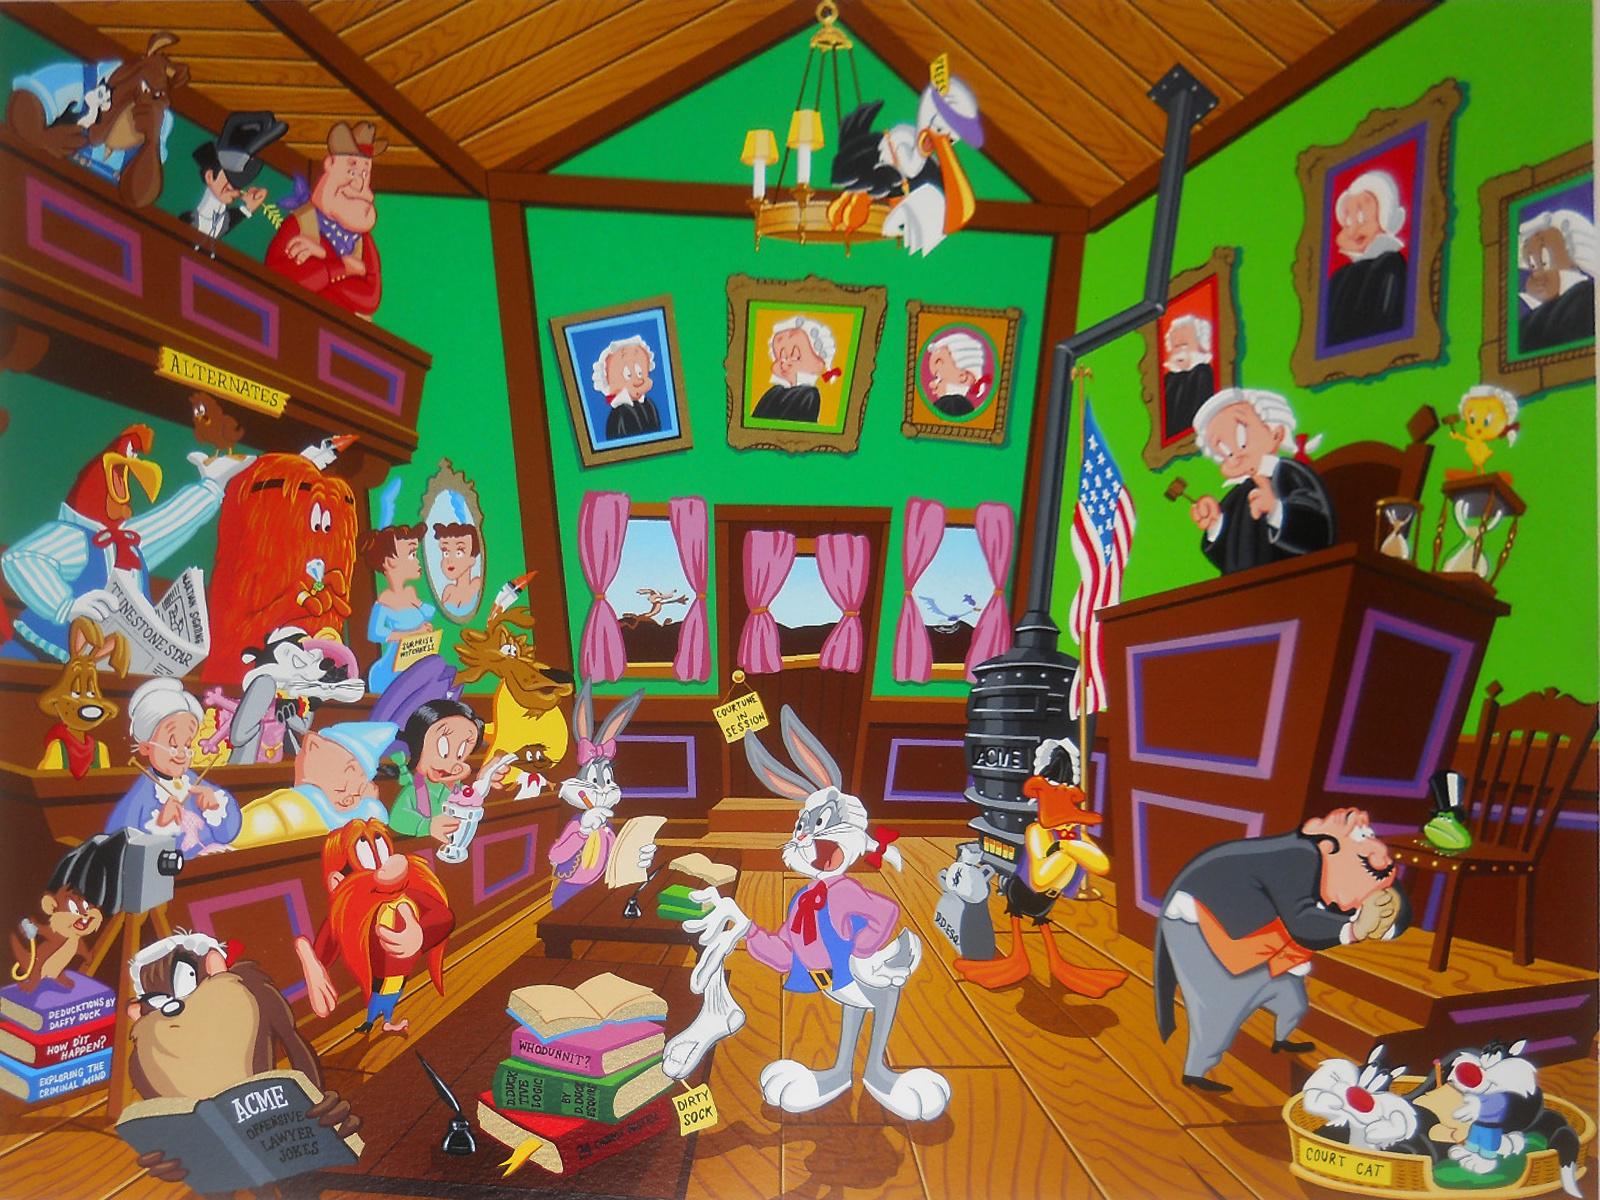 Looney tunes christmas wallpaper wallpapersafari - Looney tunes background ...